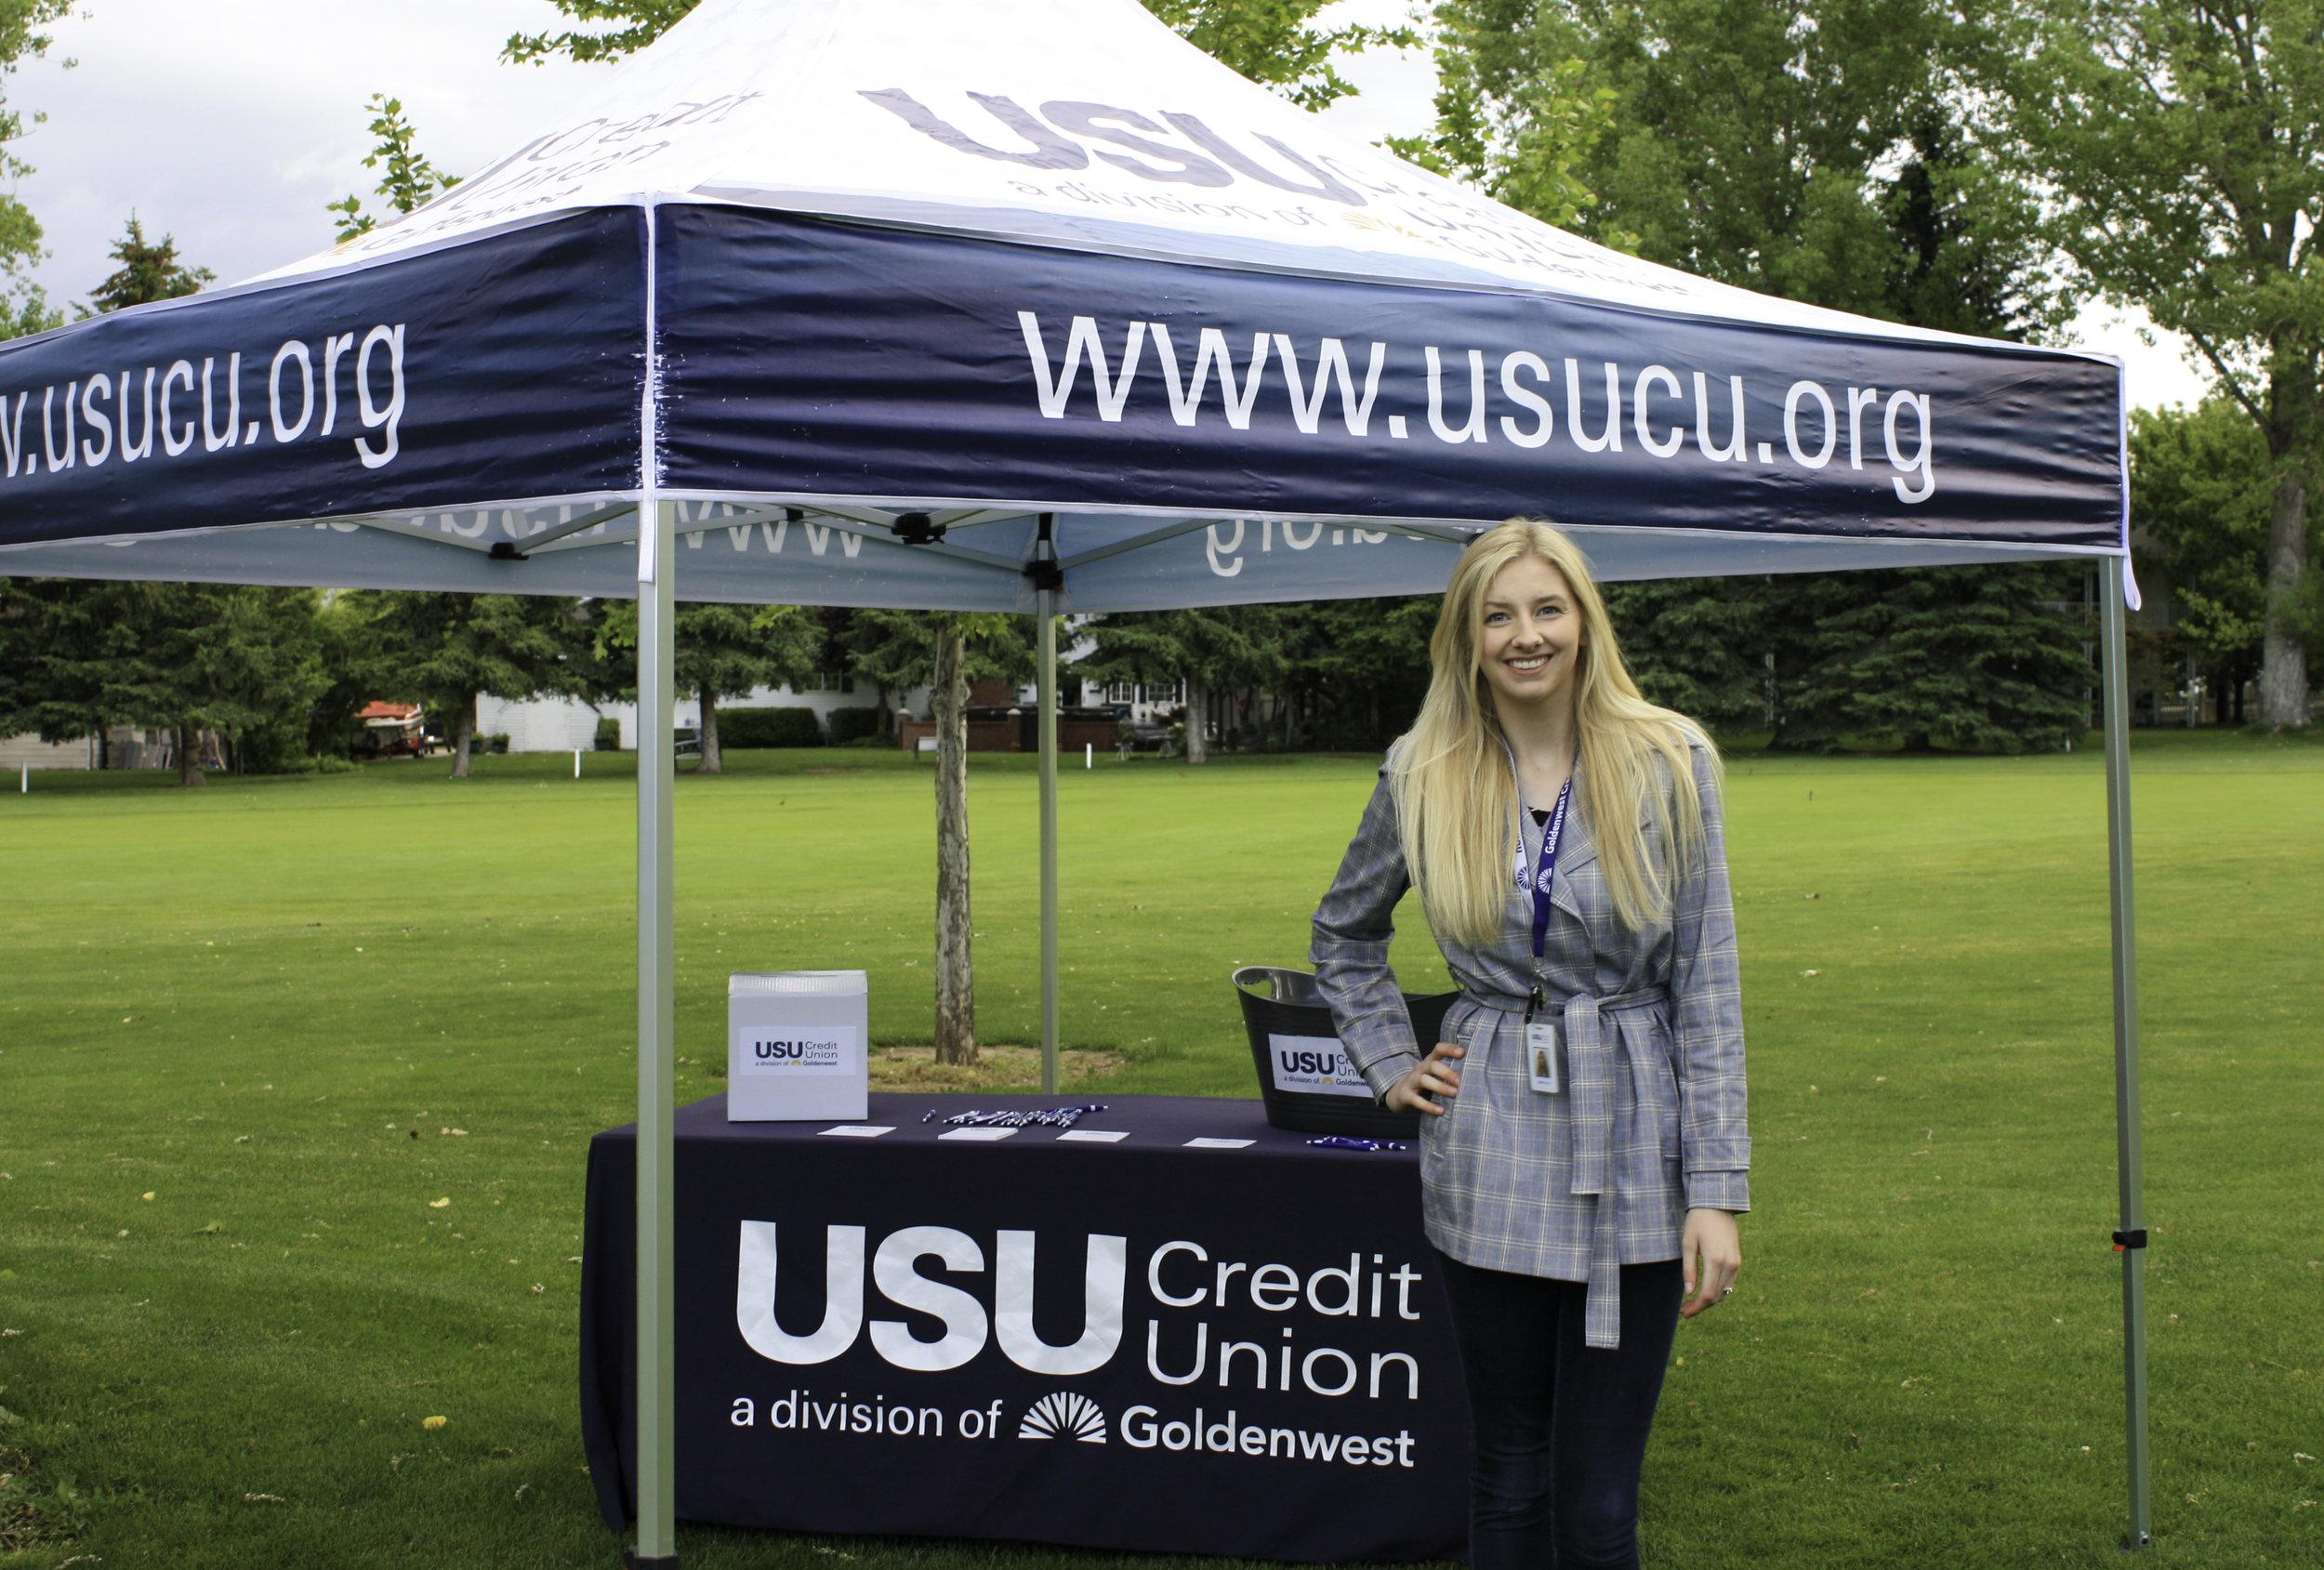 USU Credit Union 1.jpg